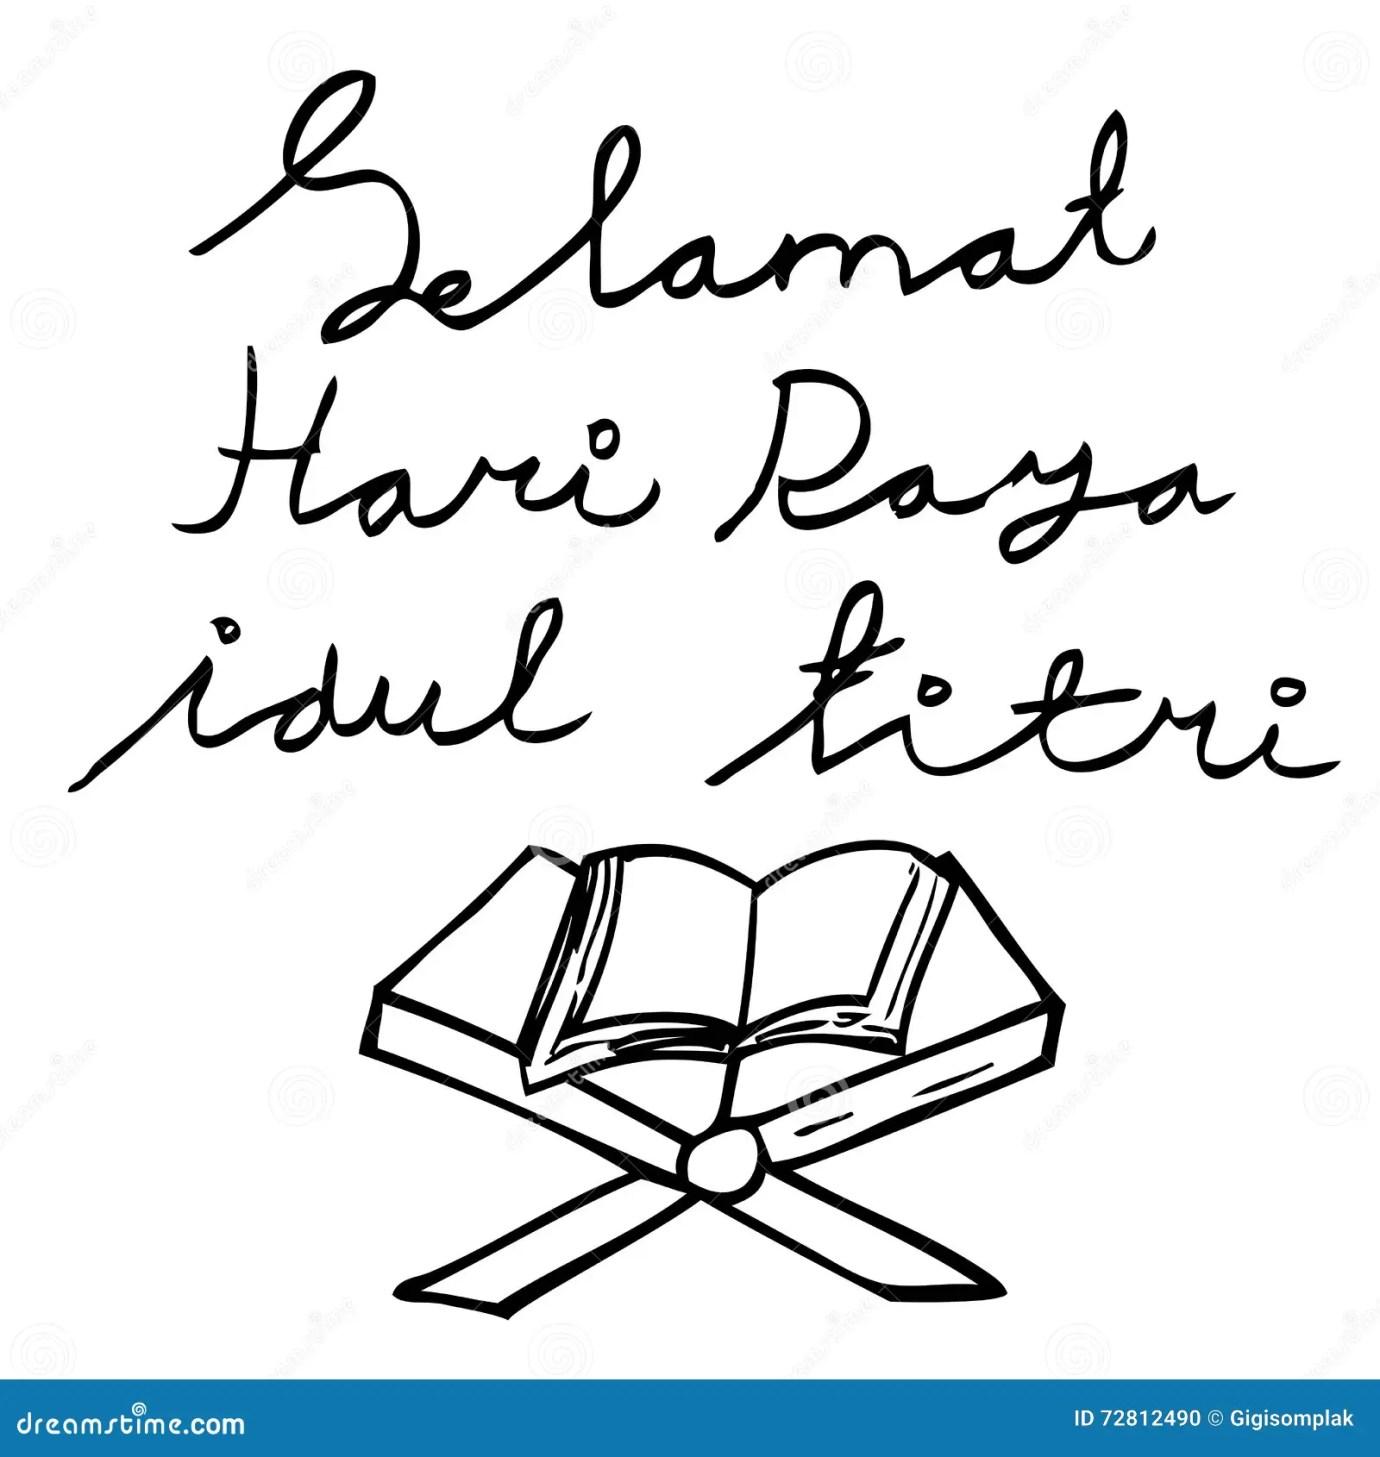 Greeting Card Selamat Hari Raya Idul Fitri Ramadhan Kareem In